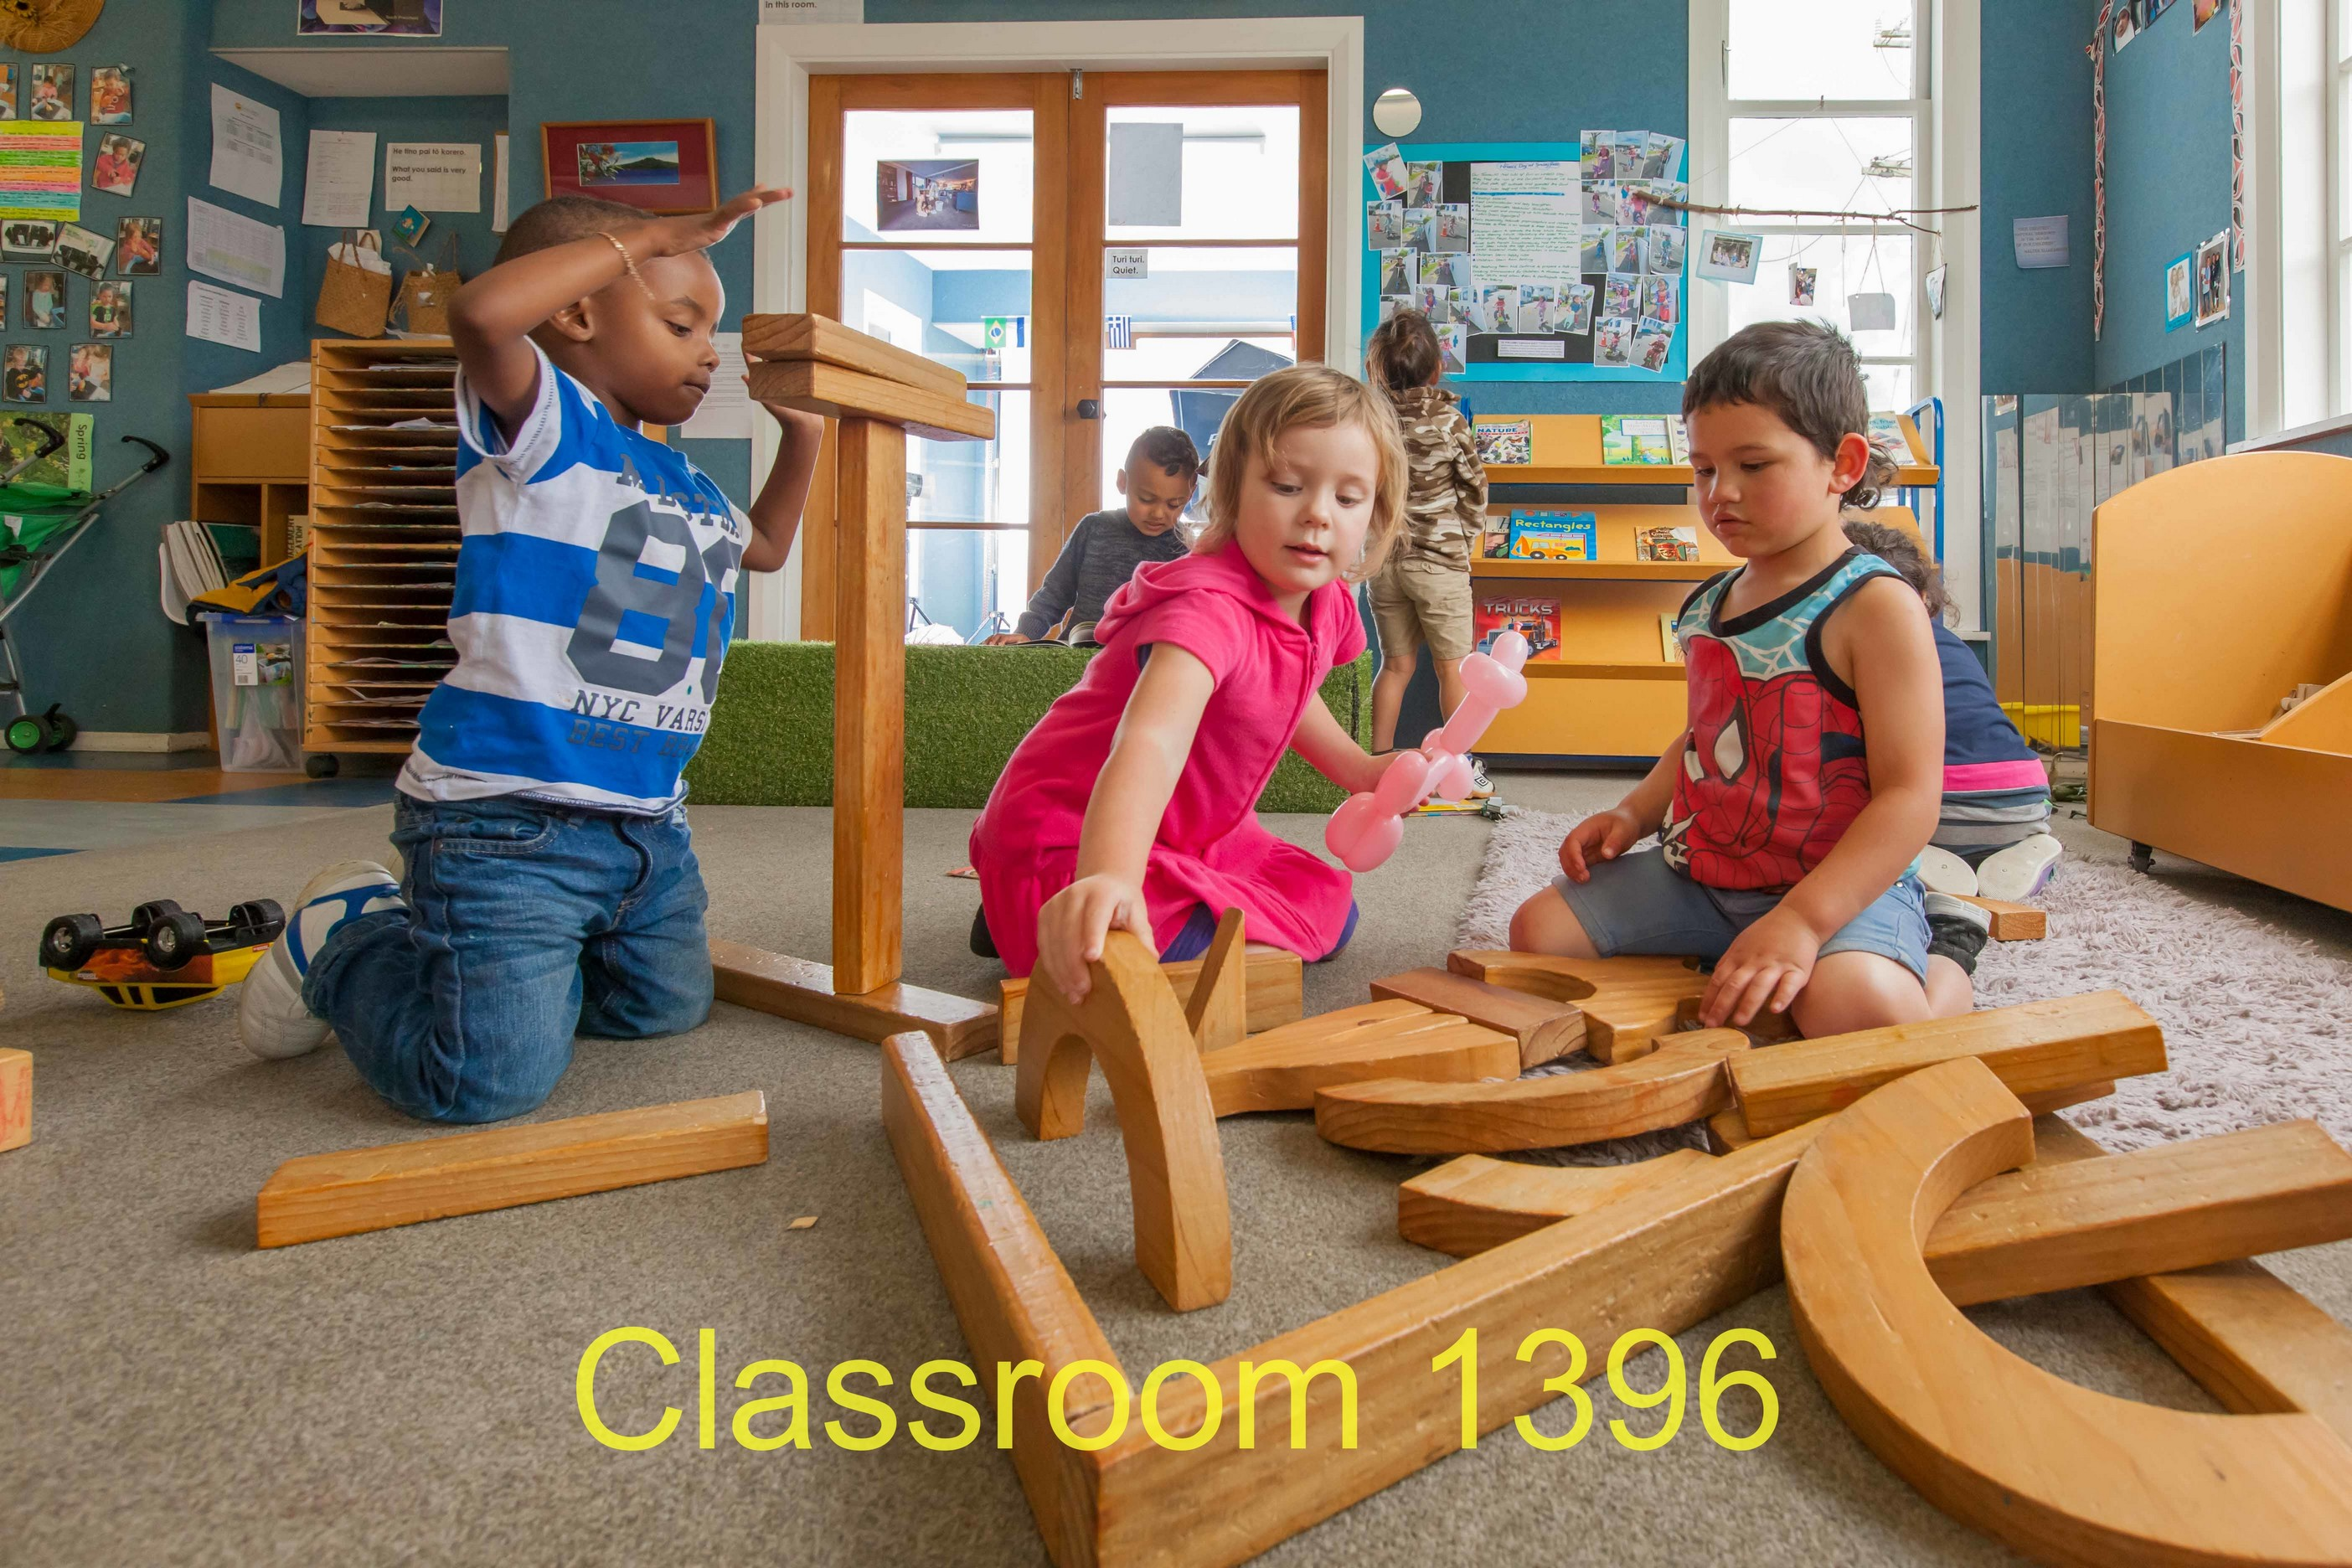 Classroom 1396